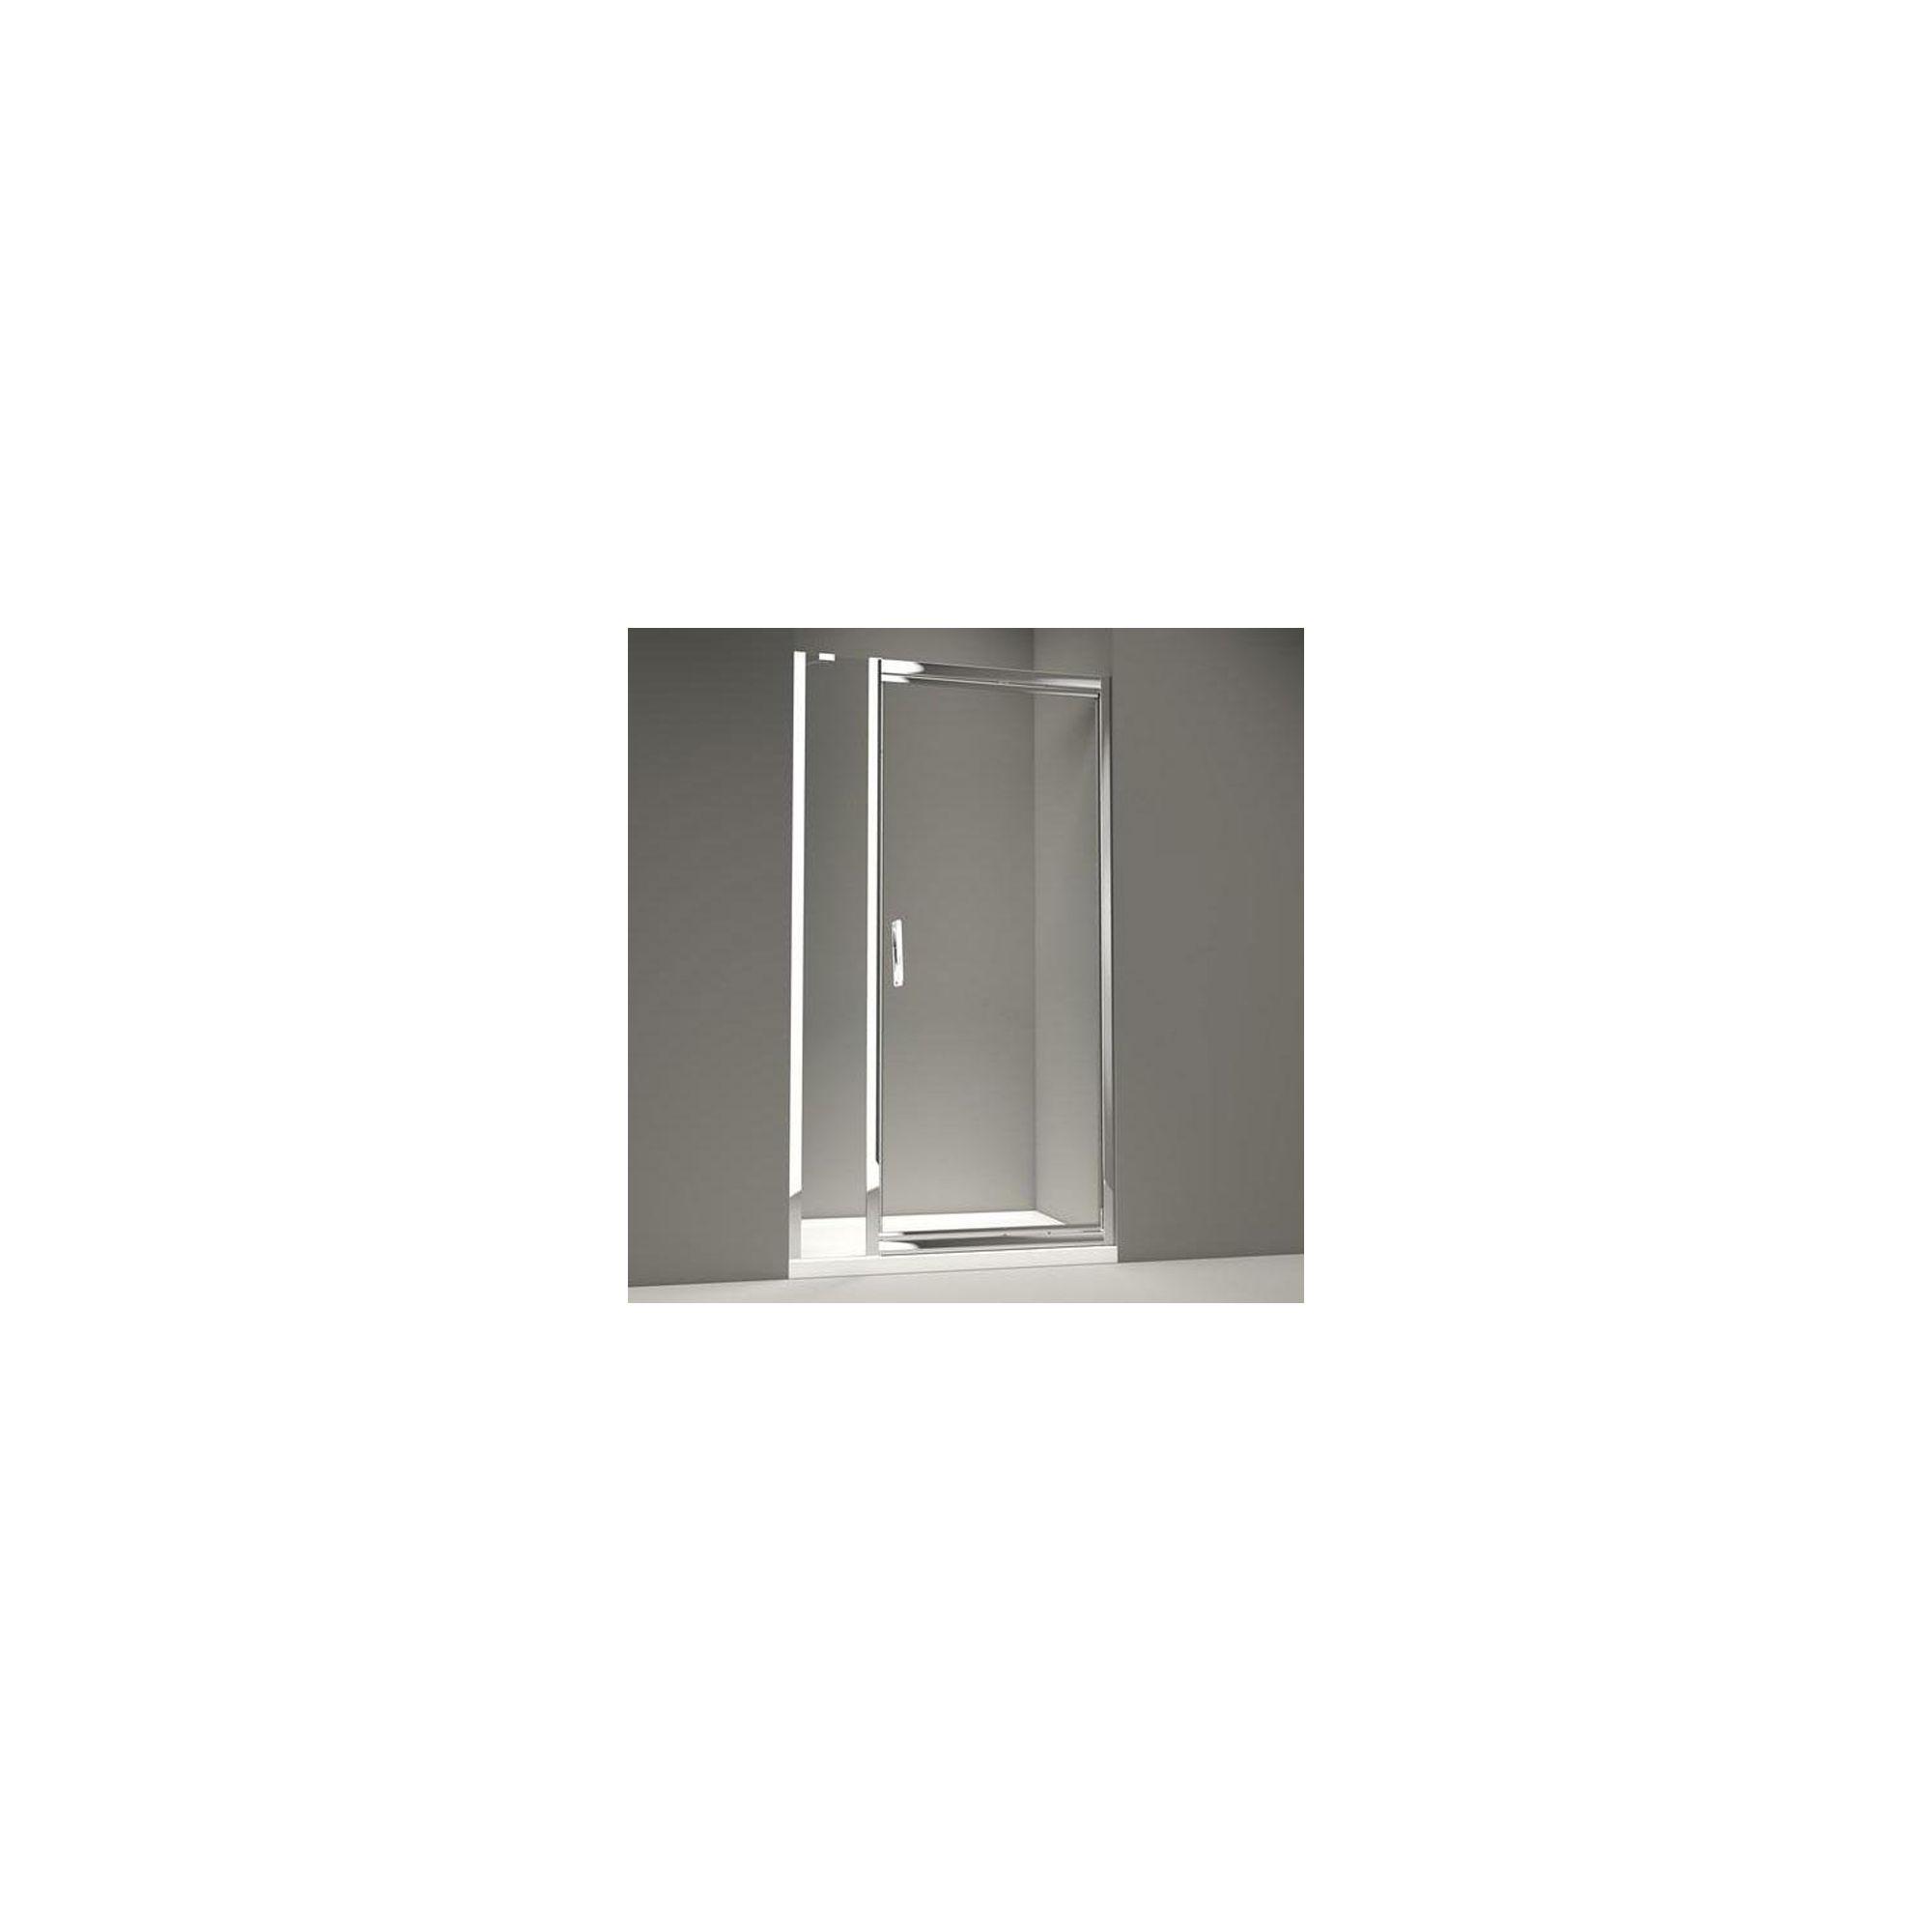 Merlyn Series 8 Inline Infold Shower Door, 1200mm Wide, Chrome Frame, 8mm Glass at Tescos Direct